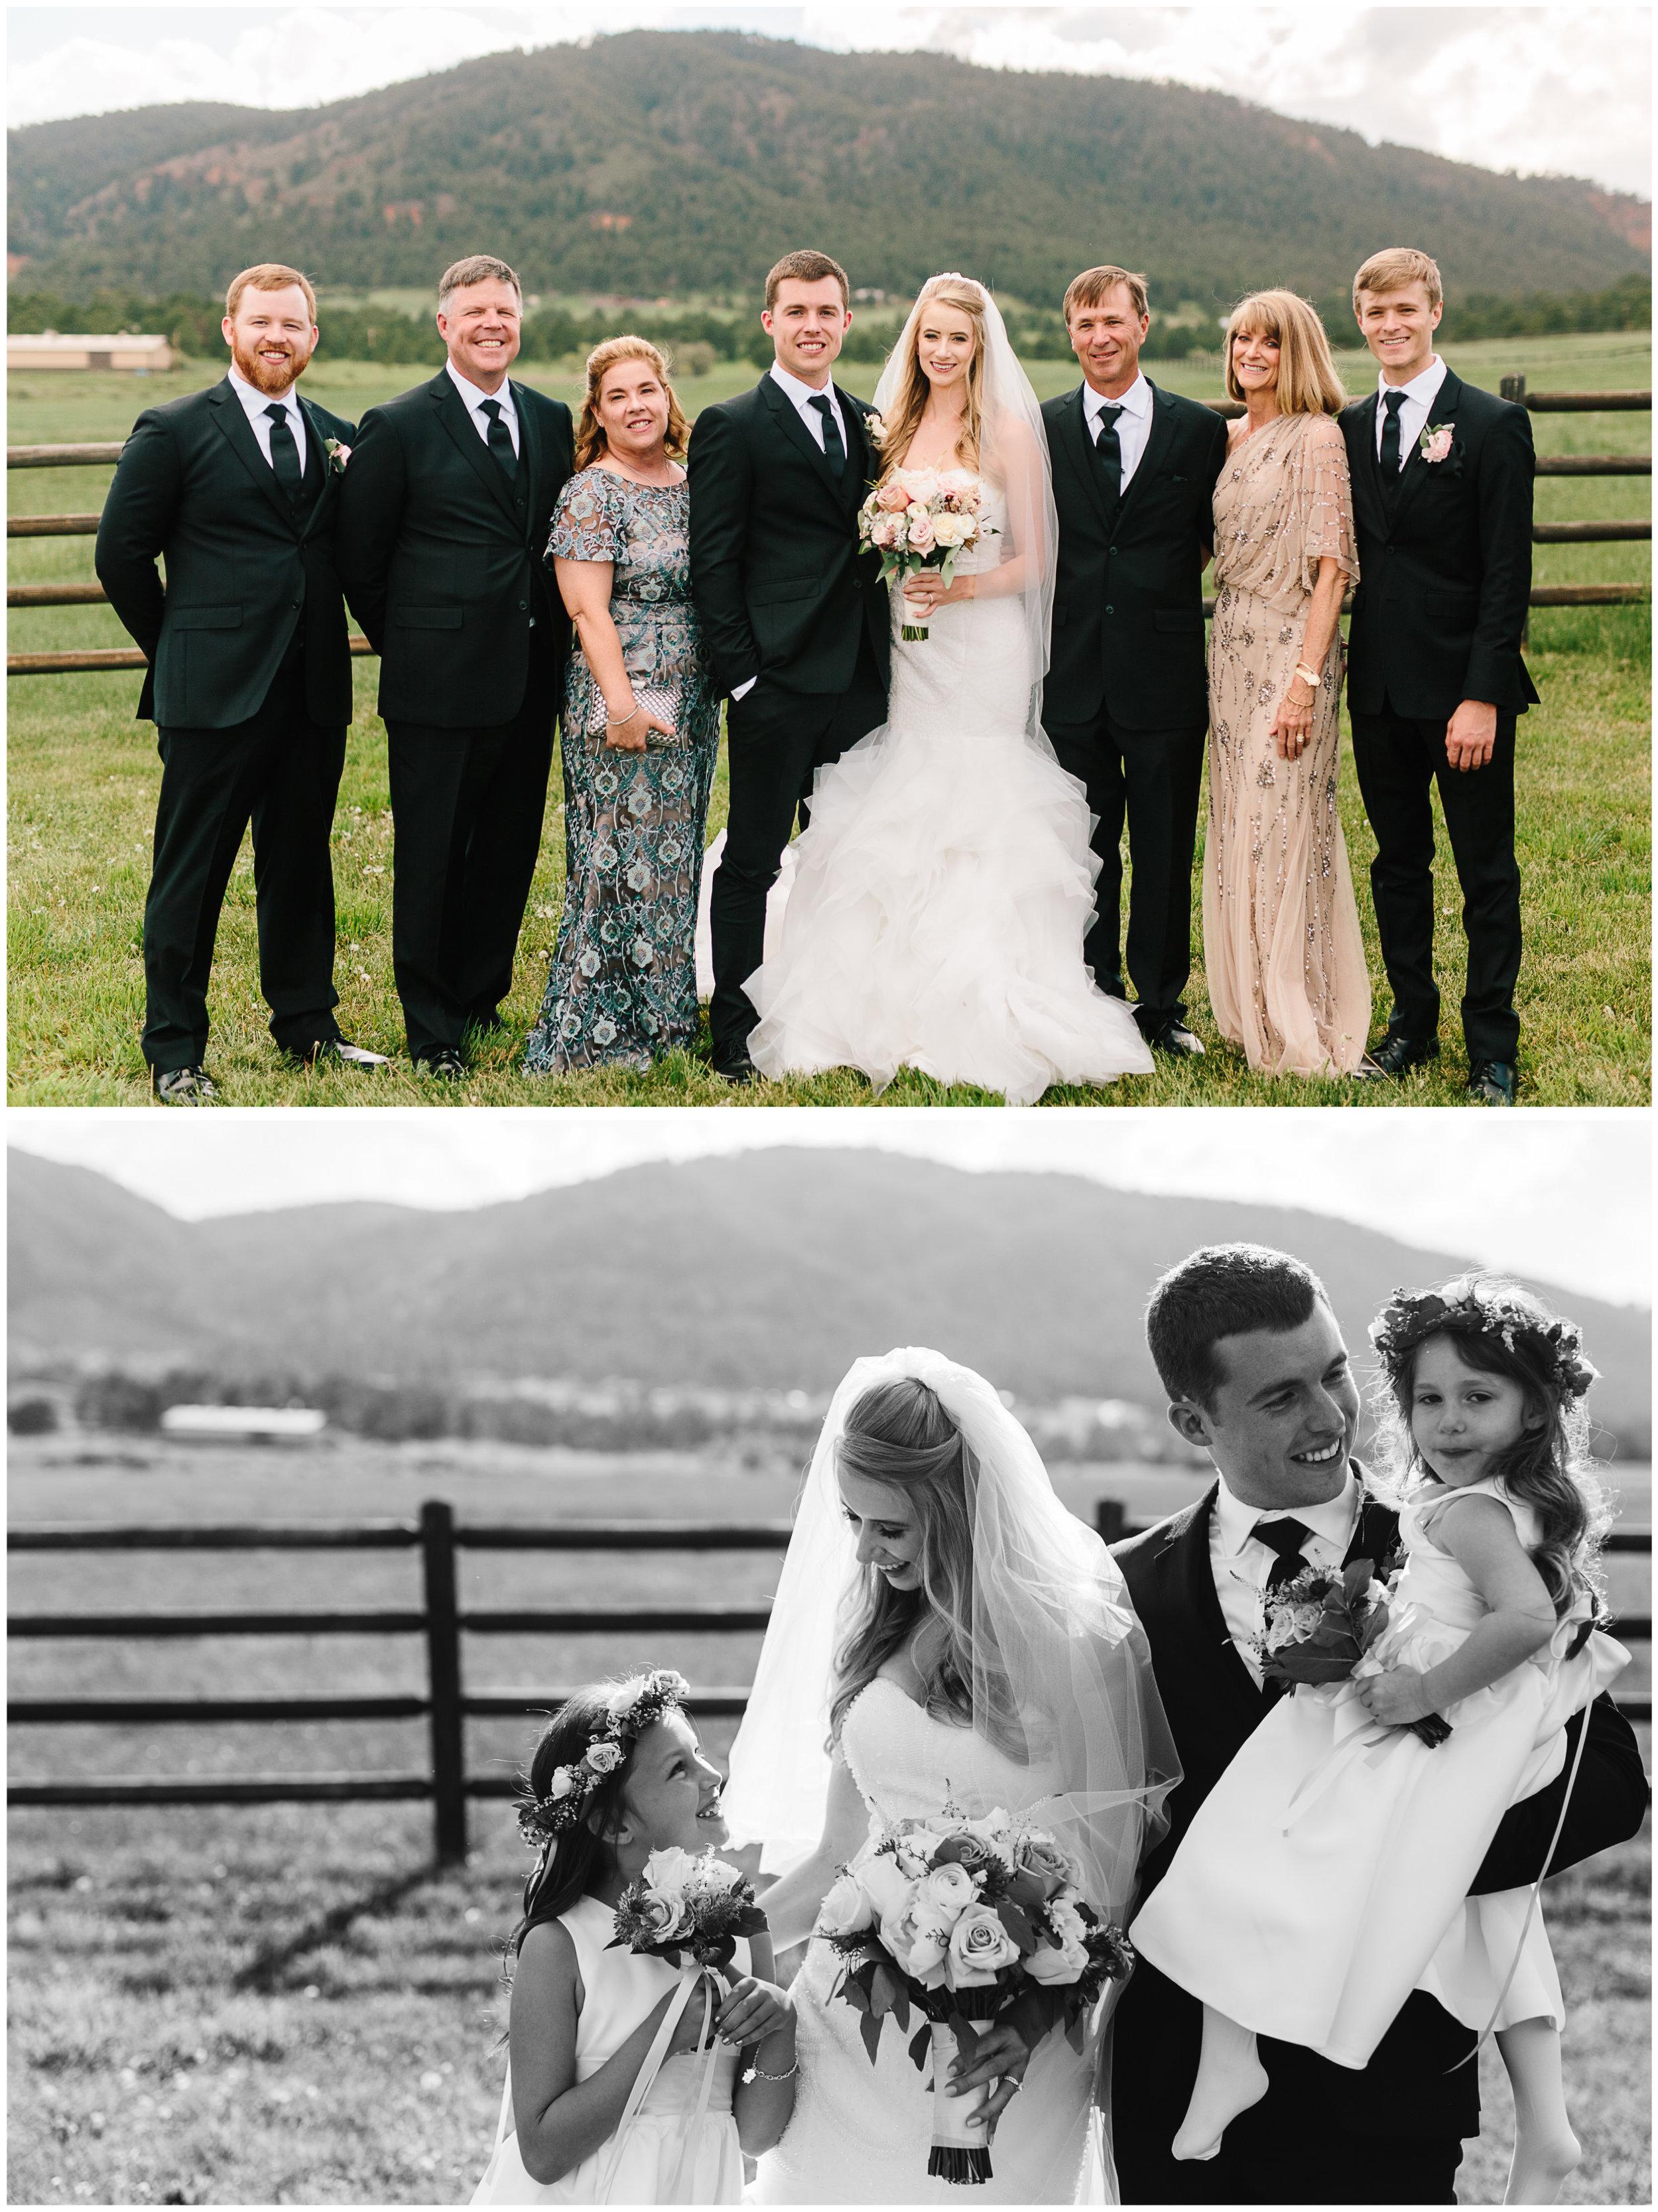 spruce_mountain_ranch_wedding_32.jpg